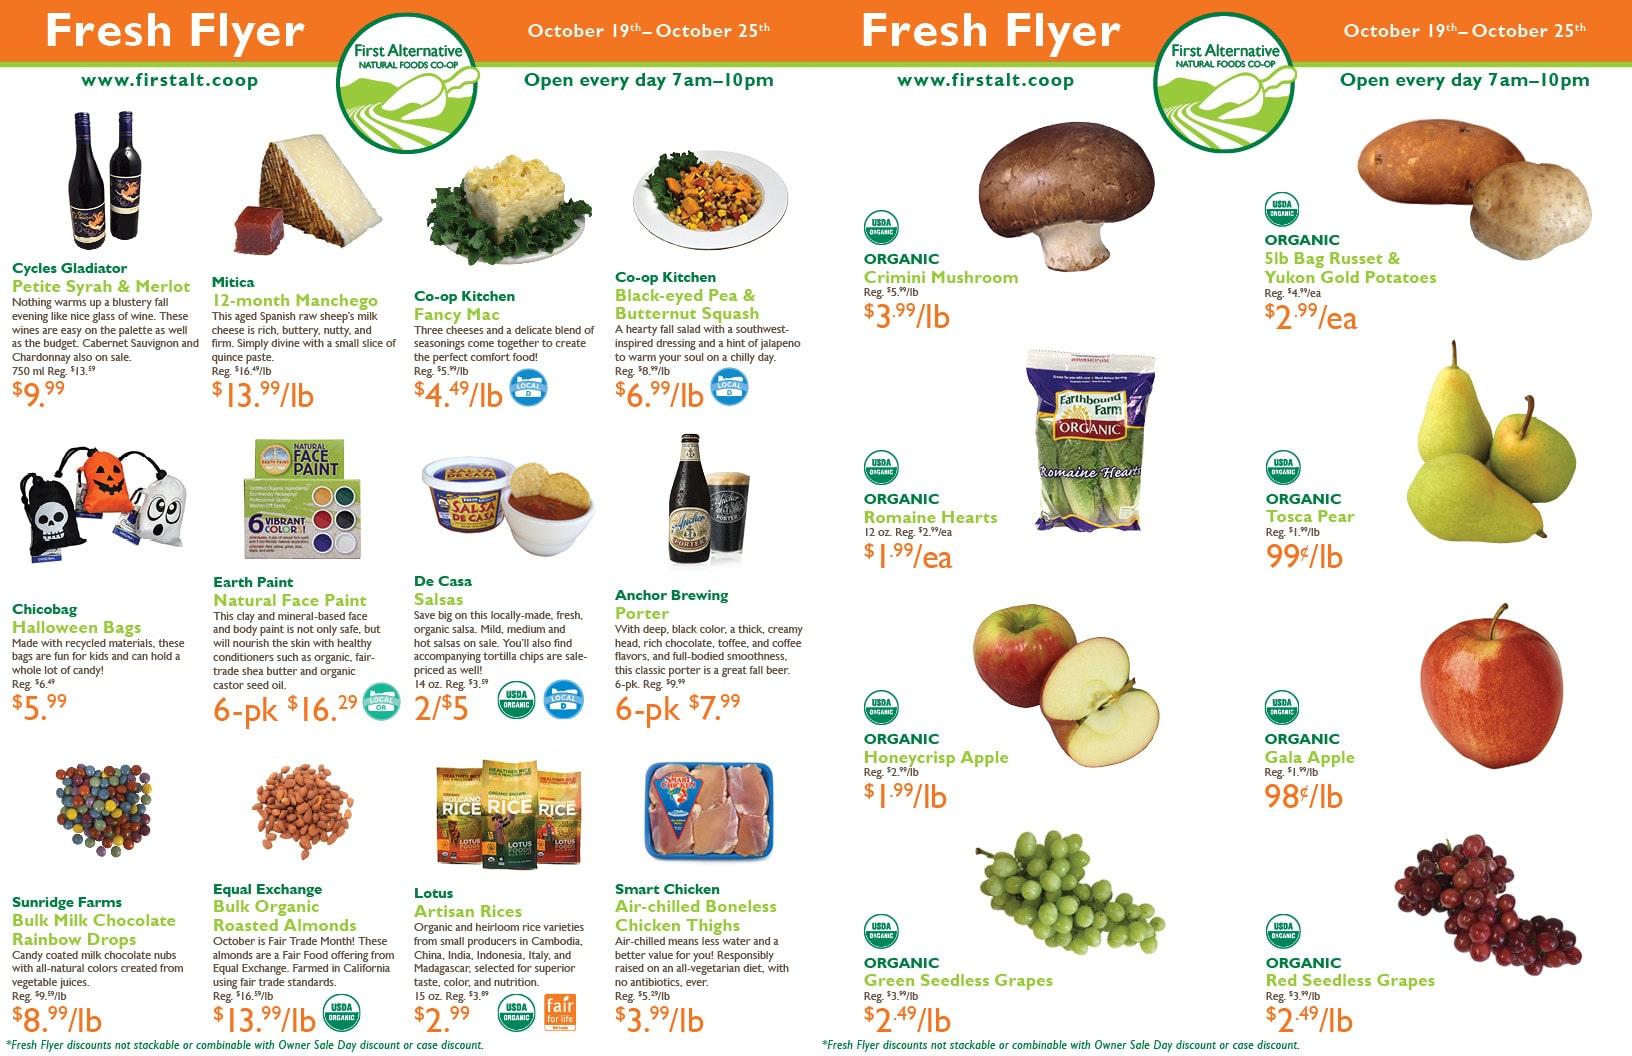 first alternative fresh flyer oct 19-25